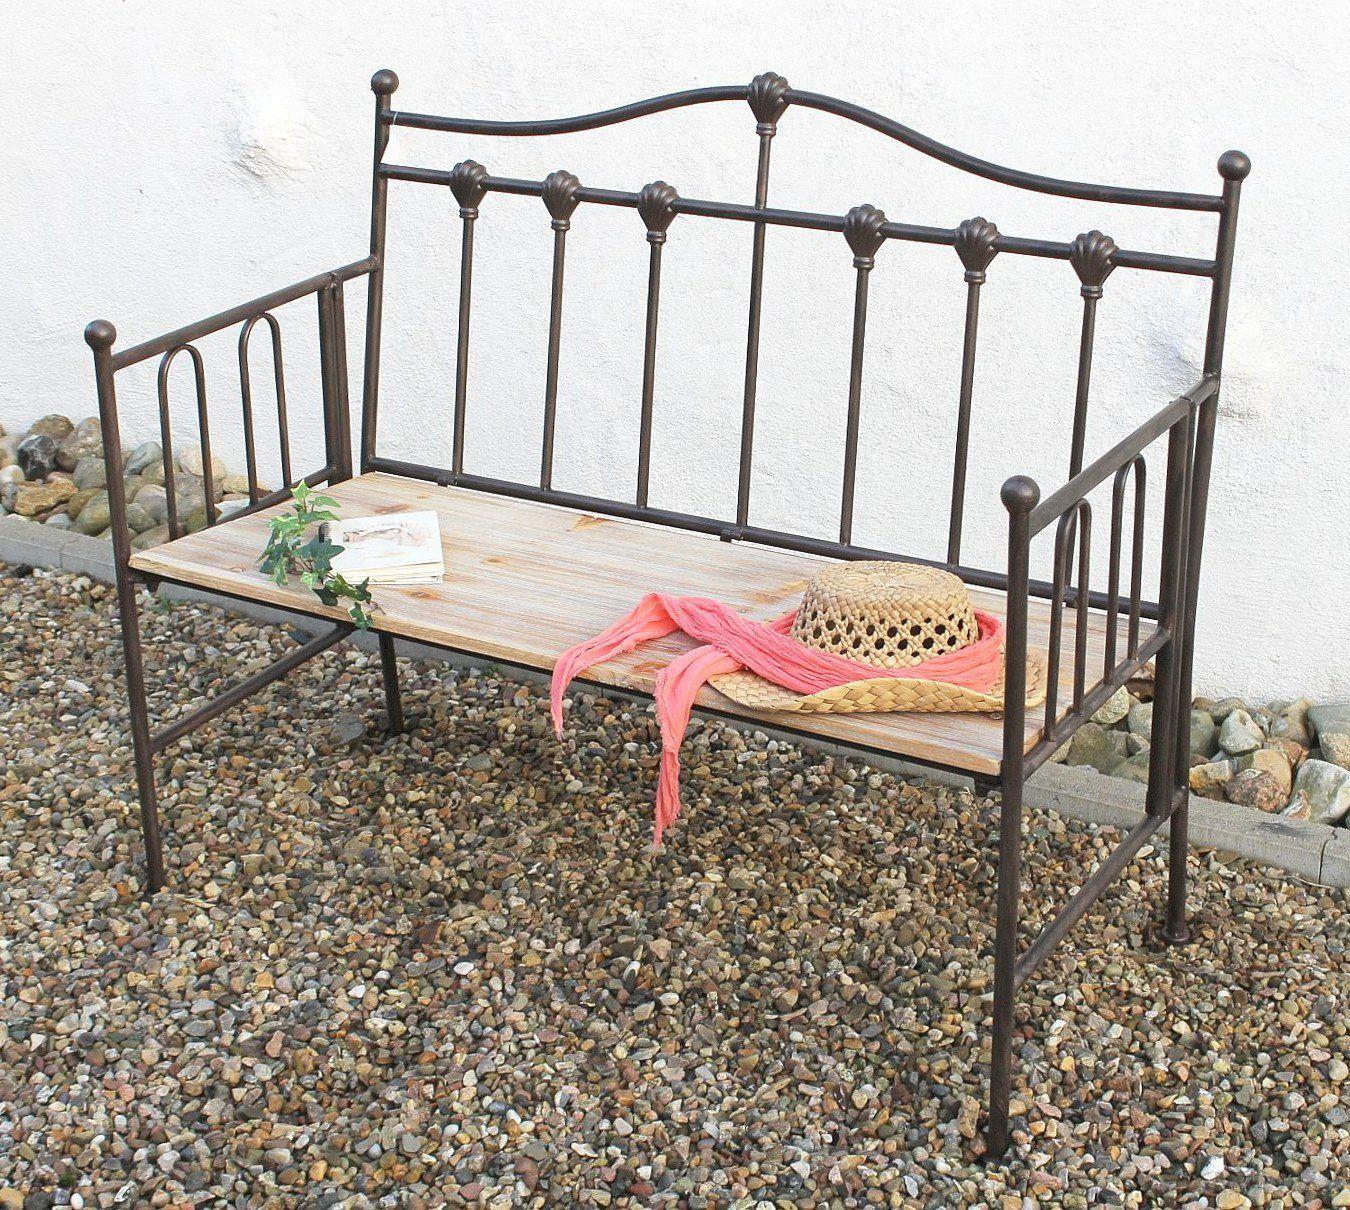 Gartenbank Metall Holz Antik Schmiedeeisen Sitzbank Metal Bench Outdoor Decor Home Decor